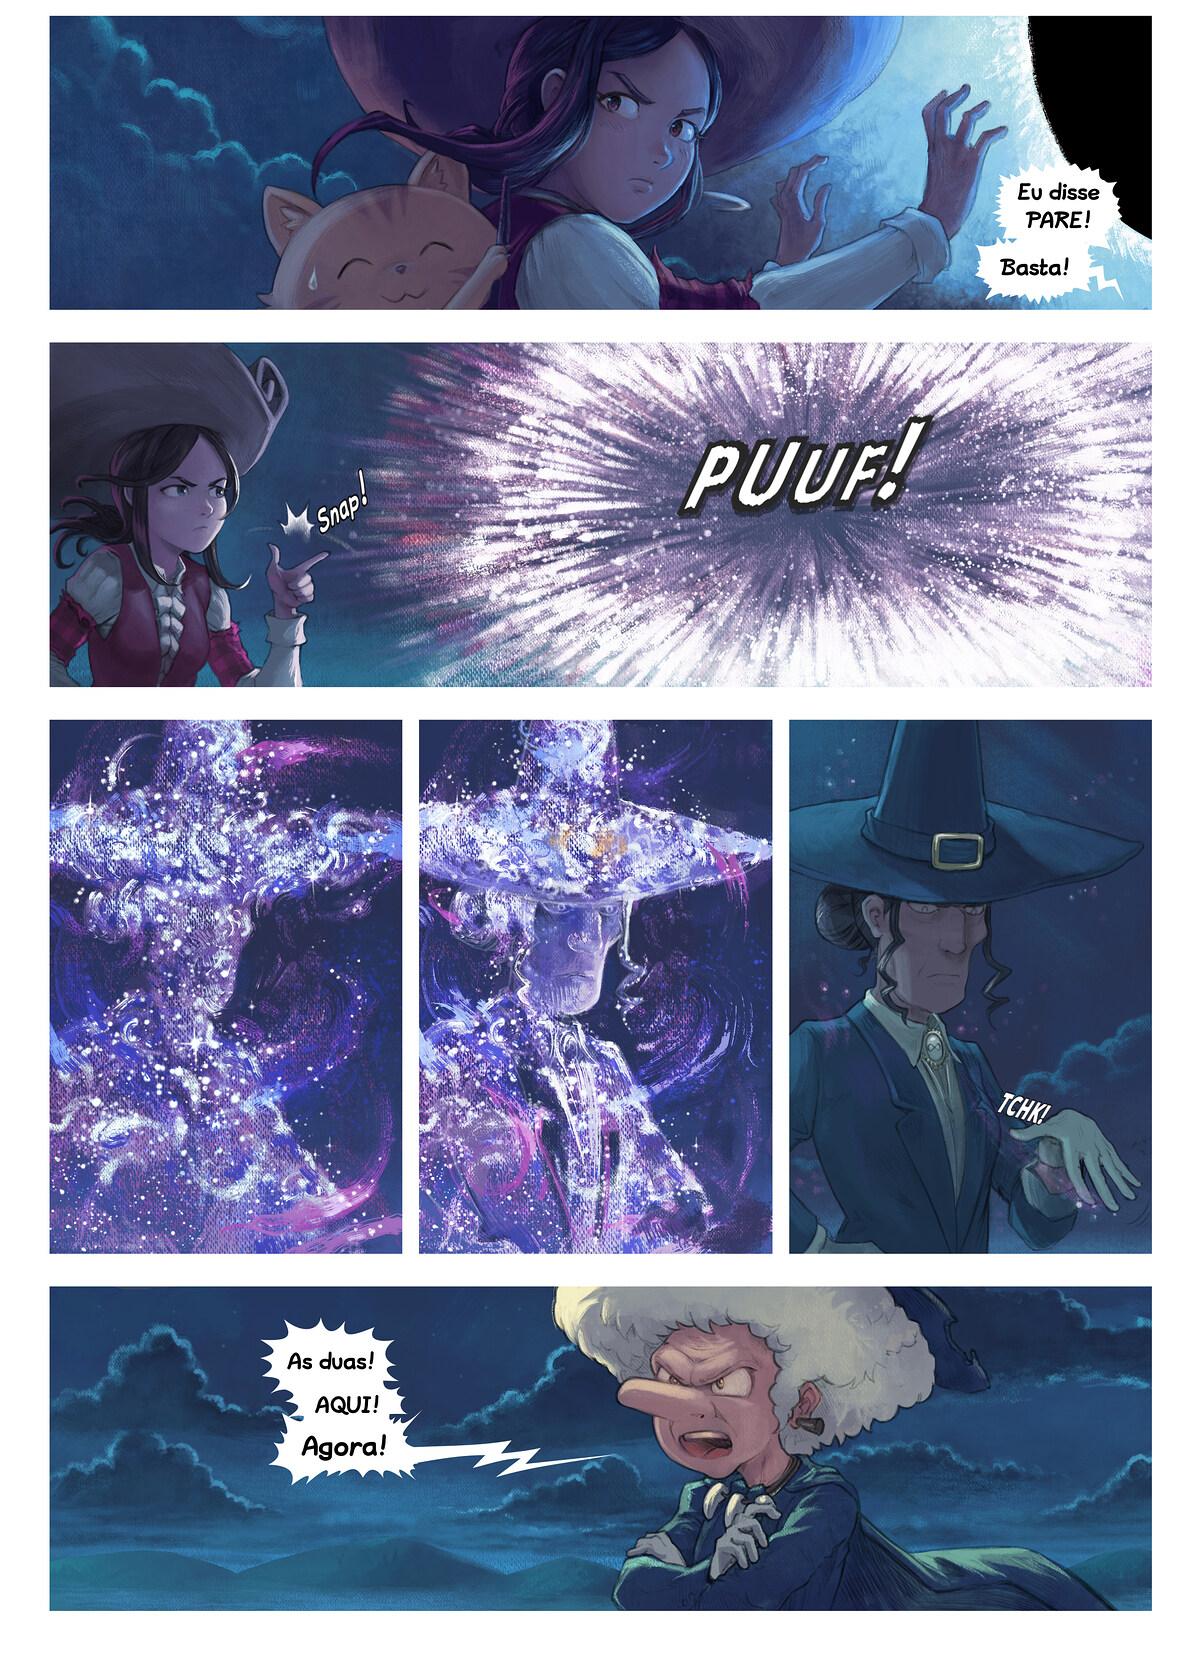 A webcomic page of Pepper&Carrot, episódio 31 [pt], página 6